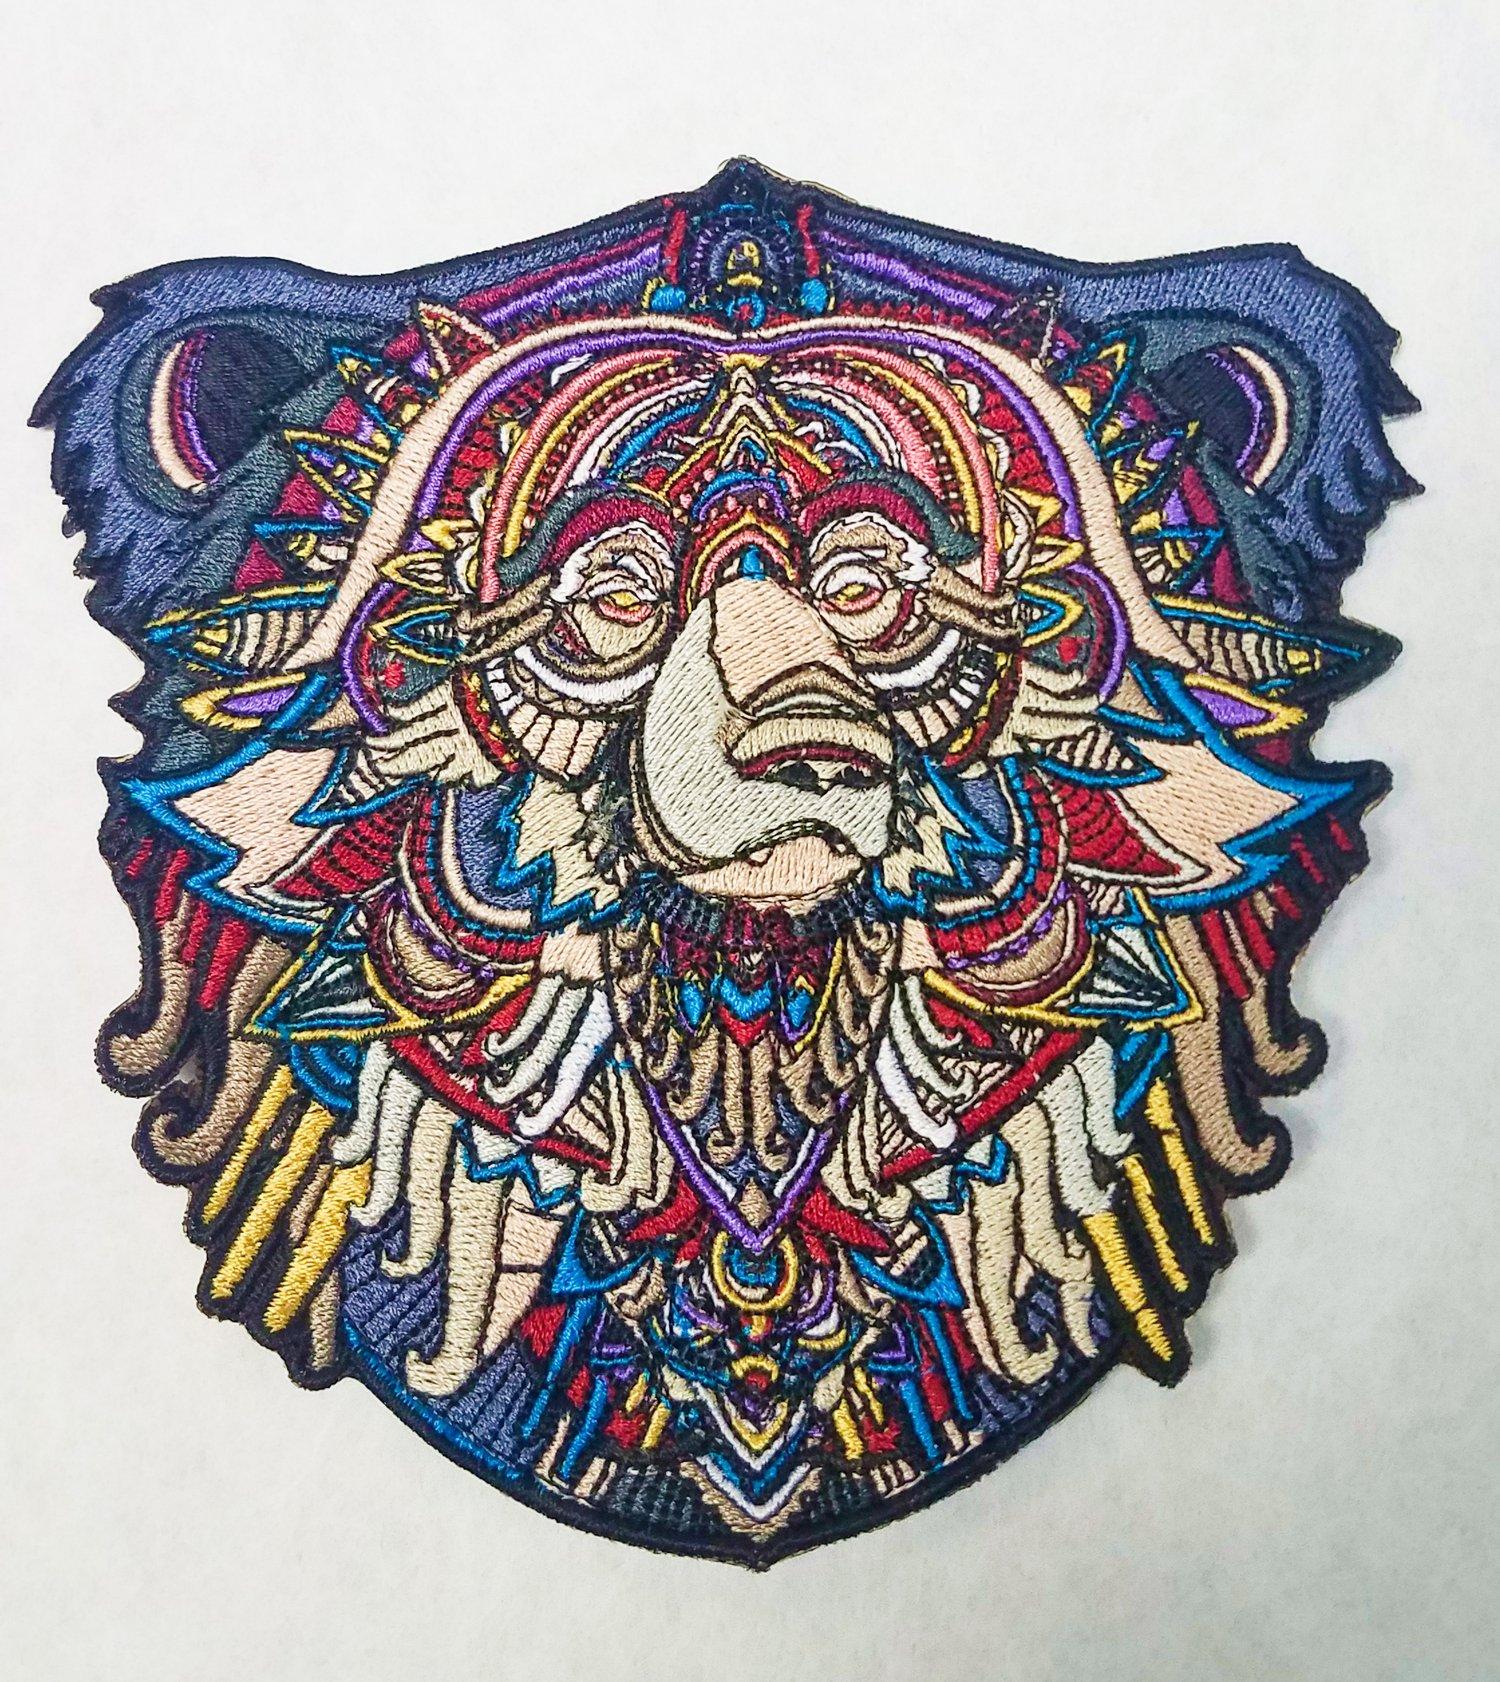 KOOZ - Sloth Bear Patch (LE 50)